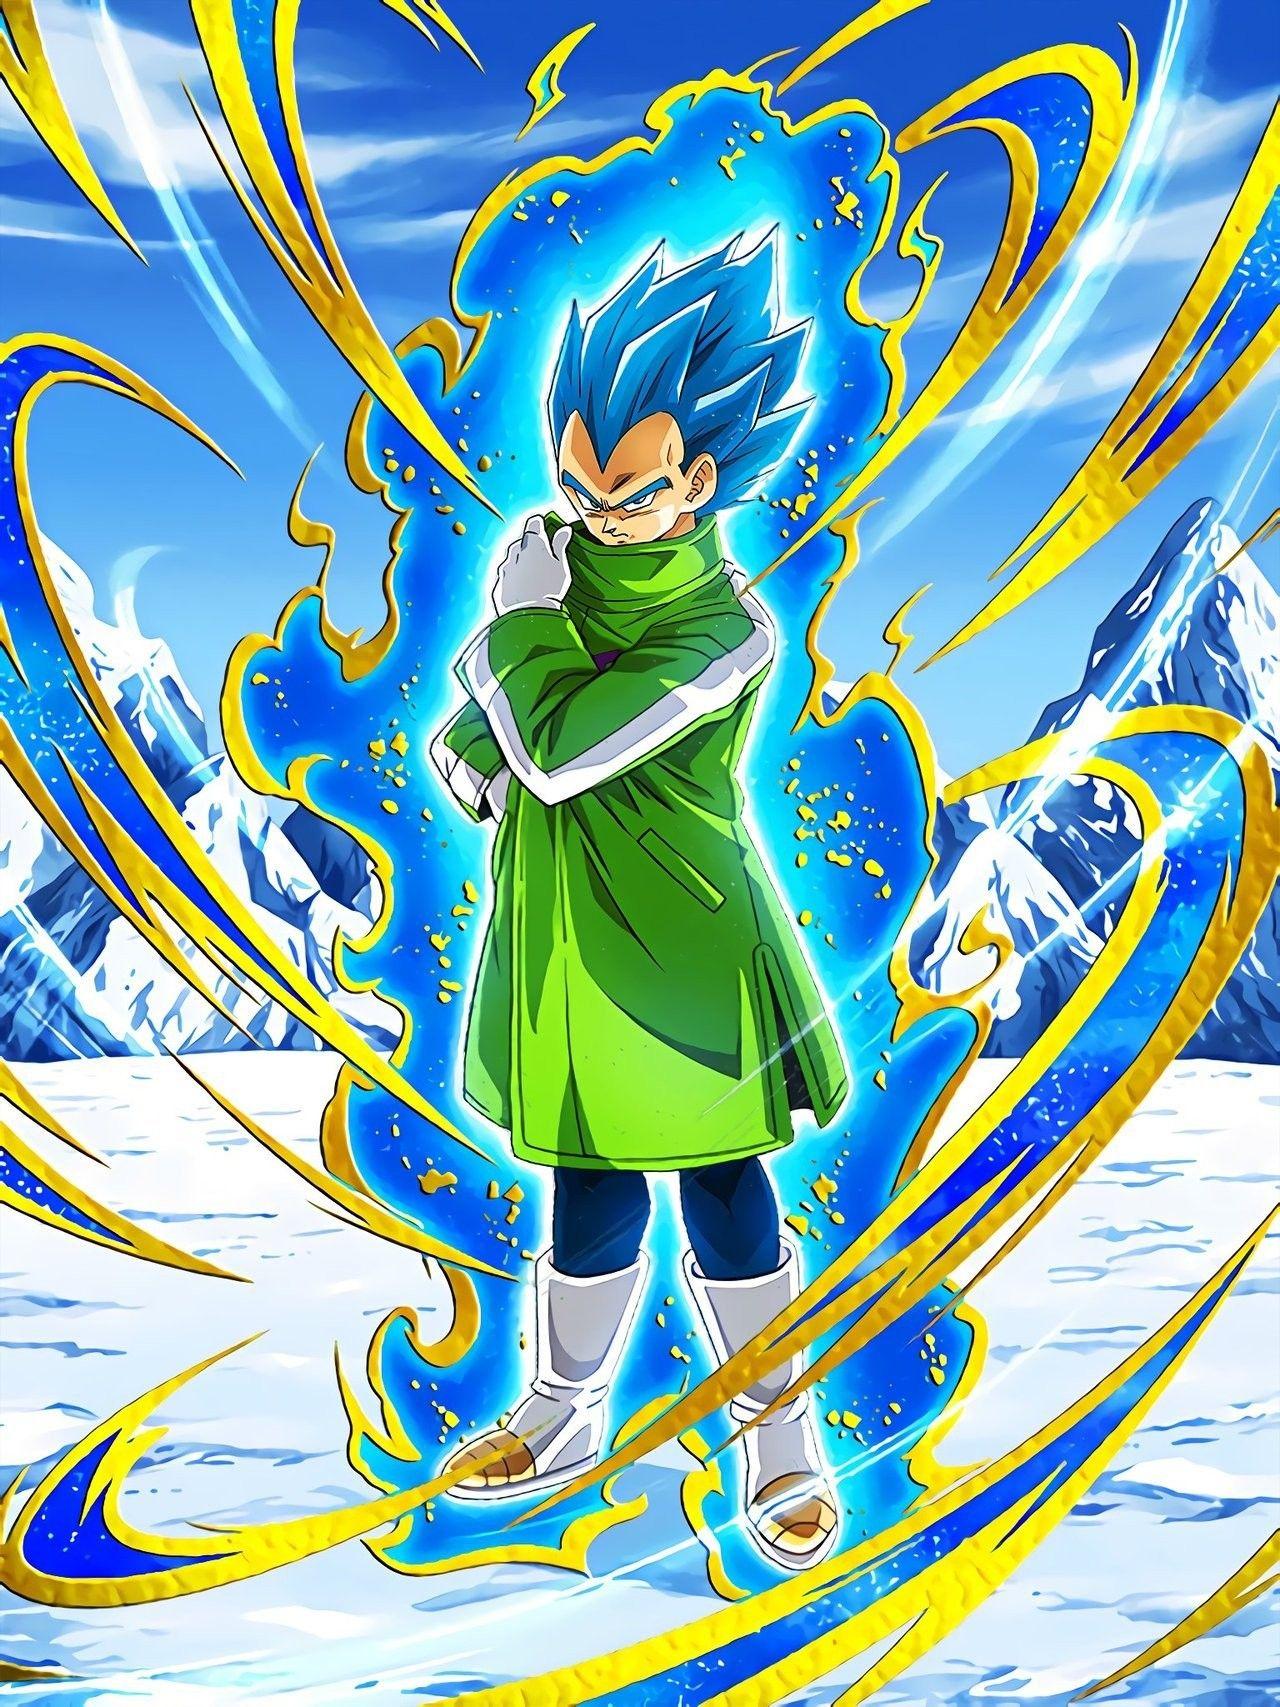 Pin By Christian Liguori On Dragonball Dragon Ball Super Anime Dragon Ball Super Dragon Ball